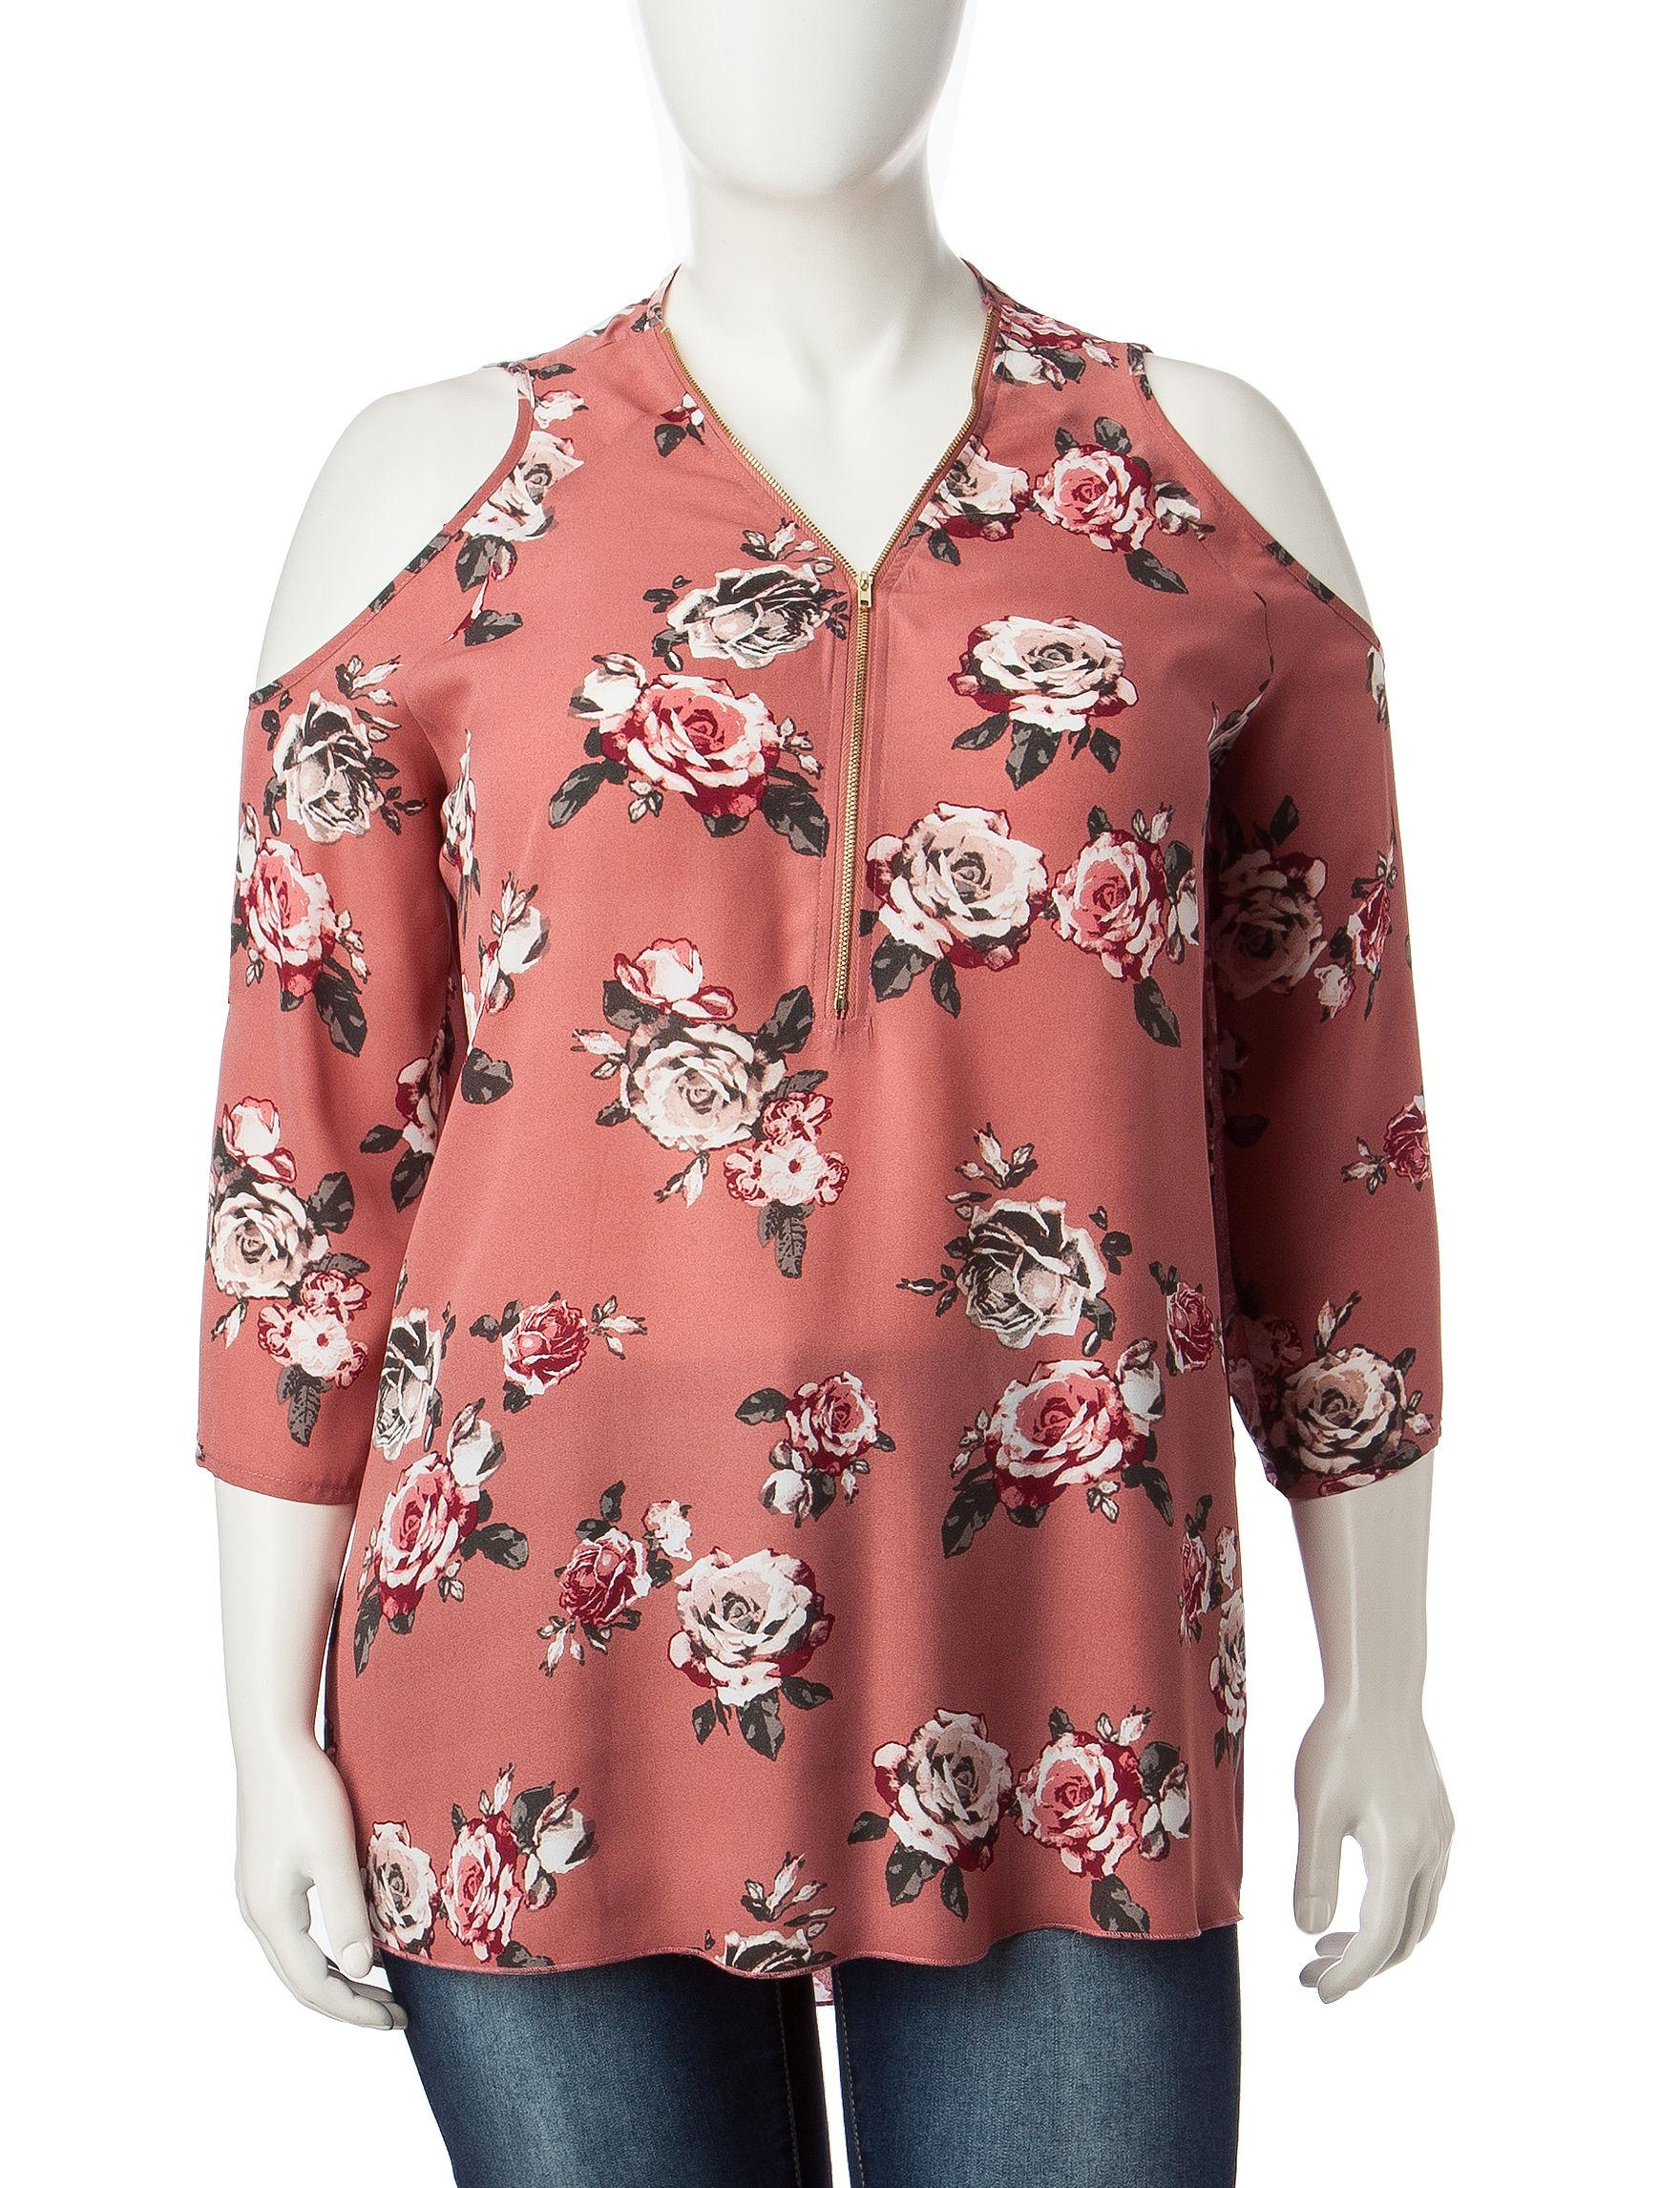 Justify 01 Pink Shirts & Blouses